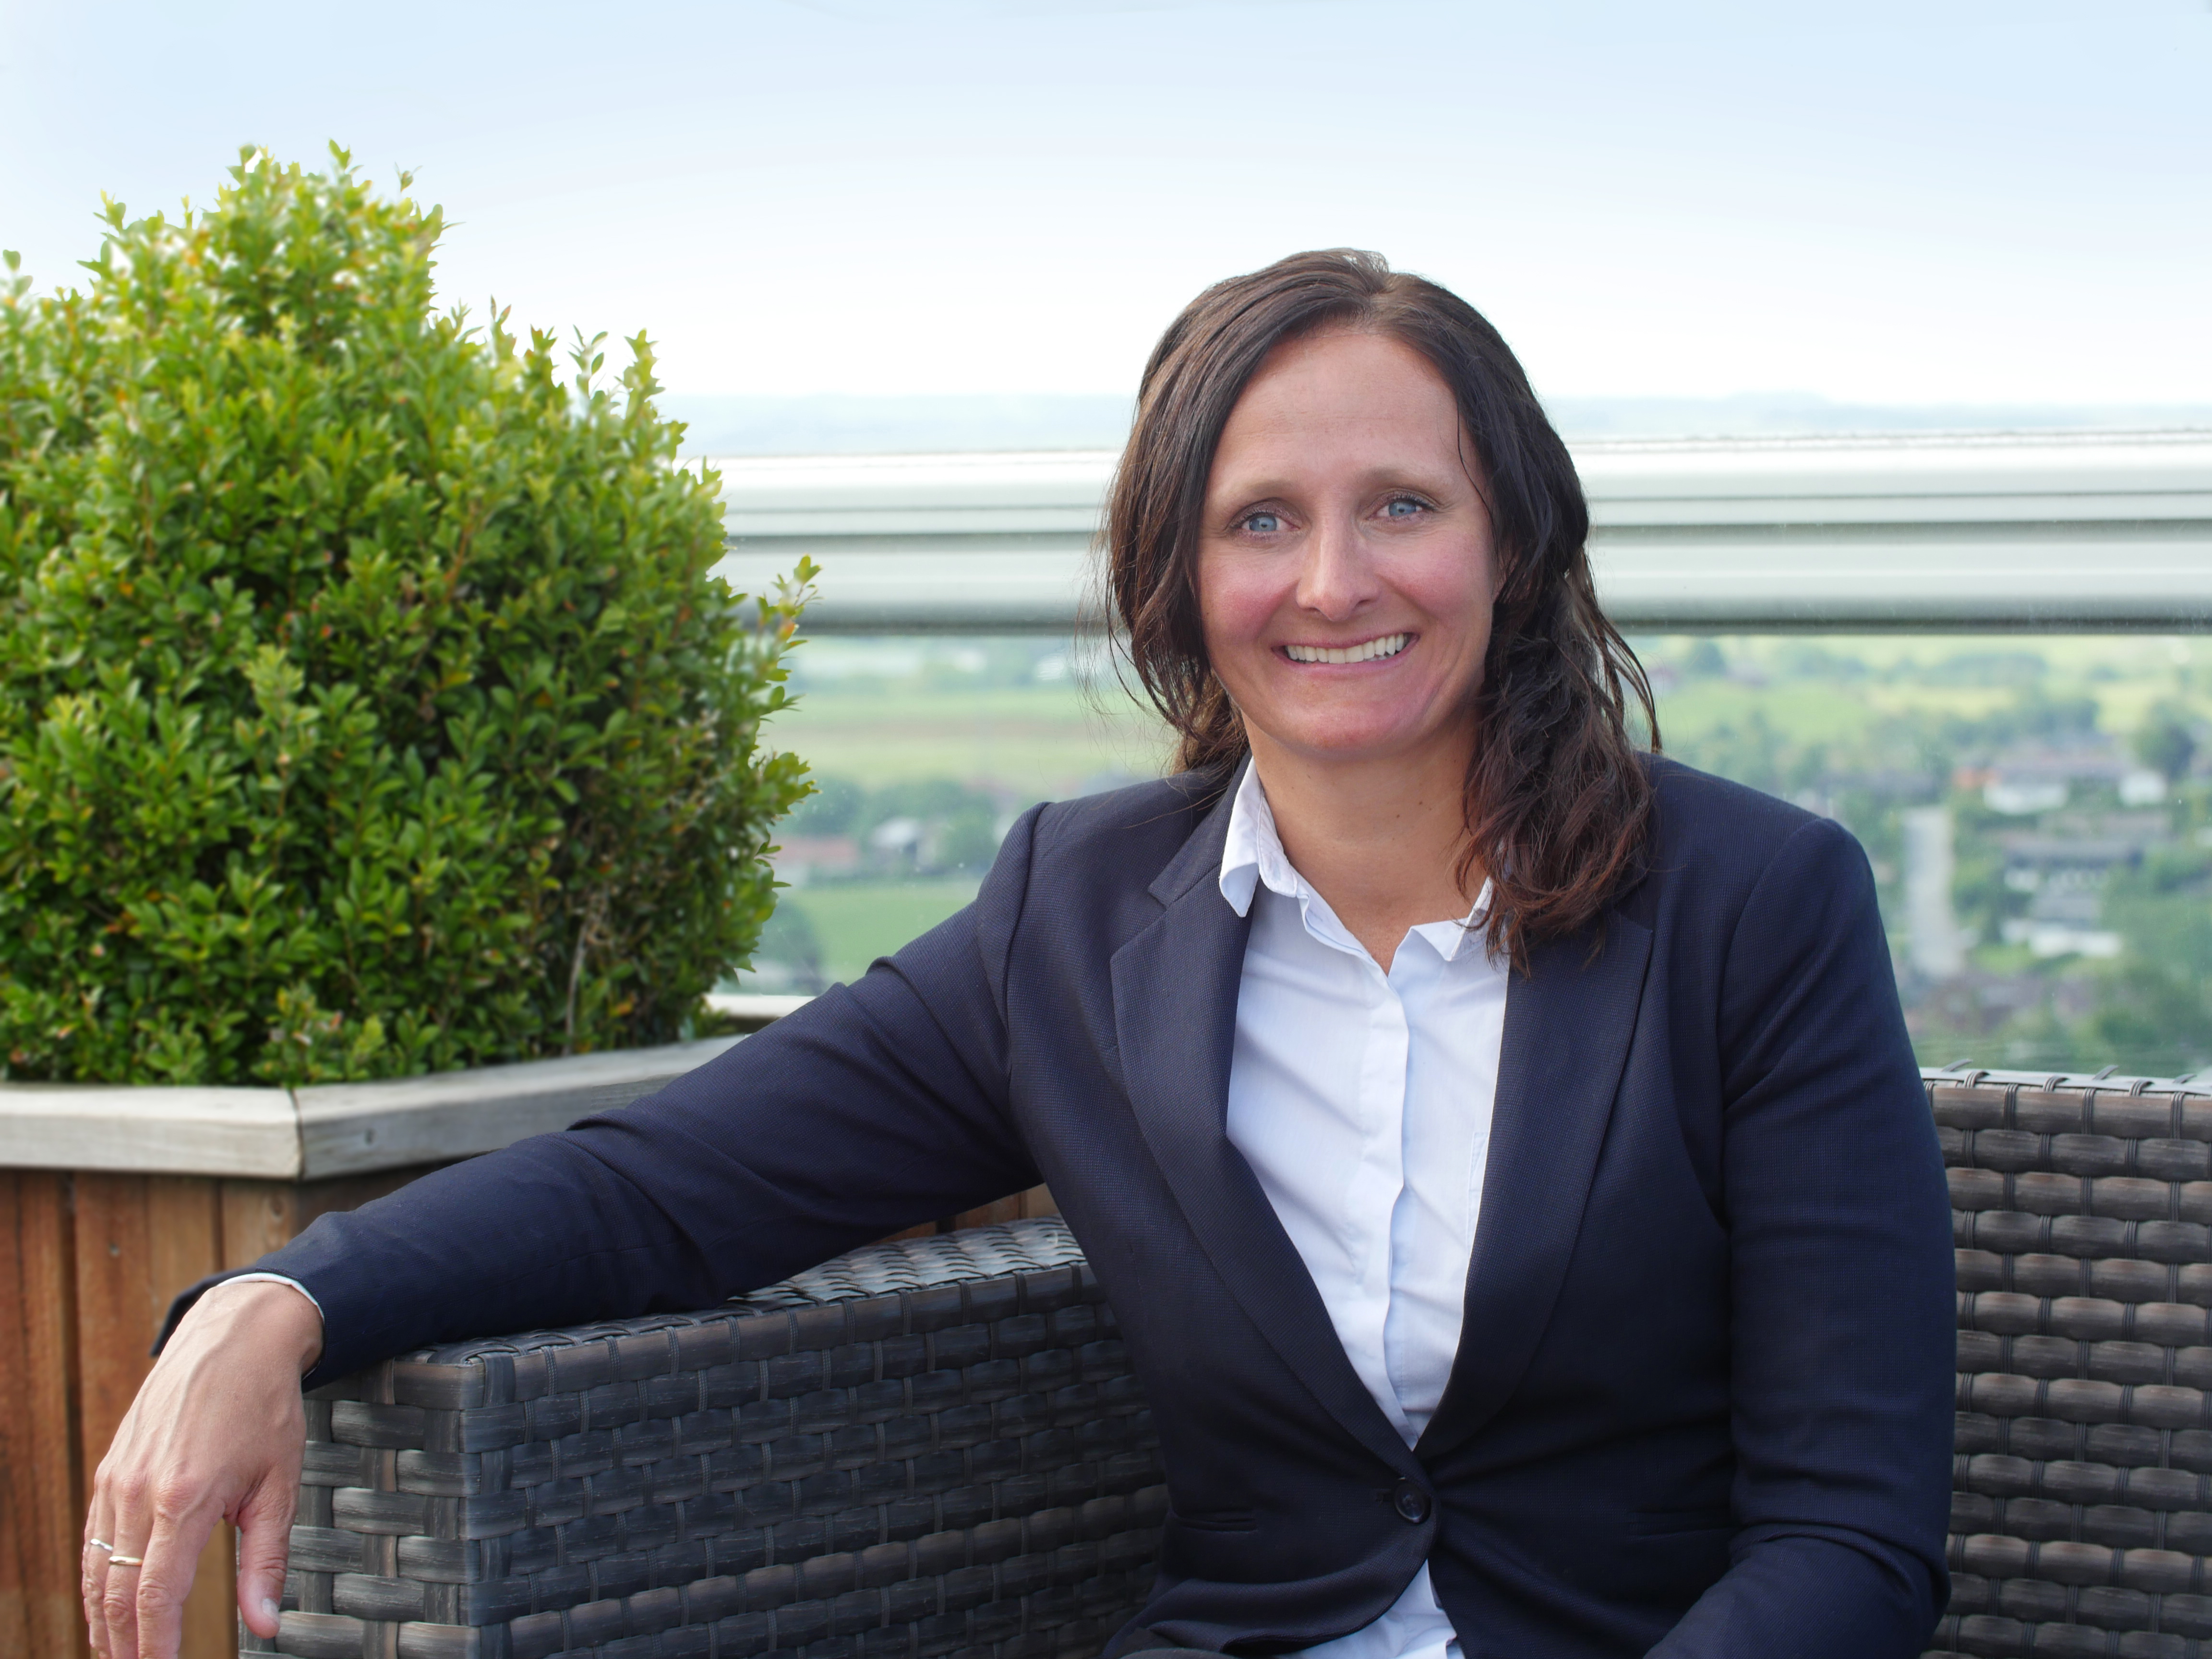 Annette Anfinnsen